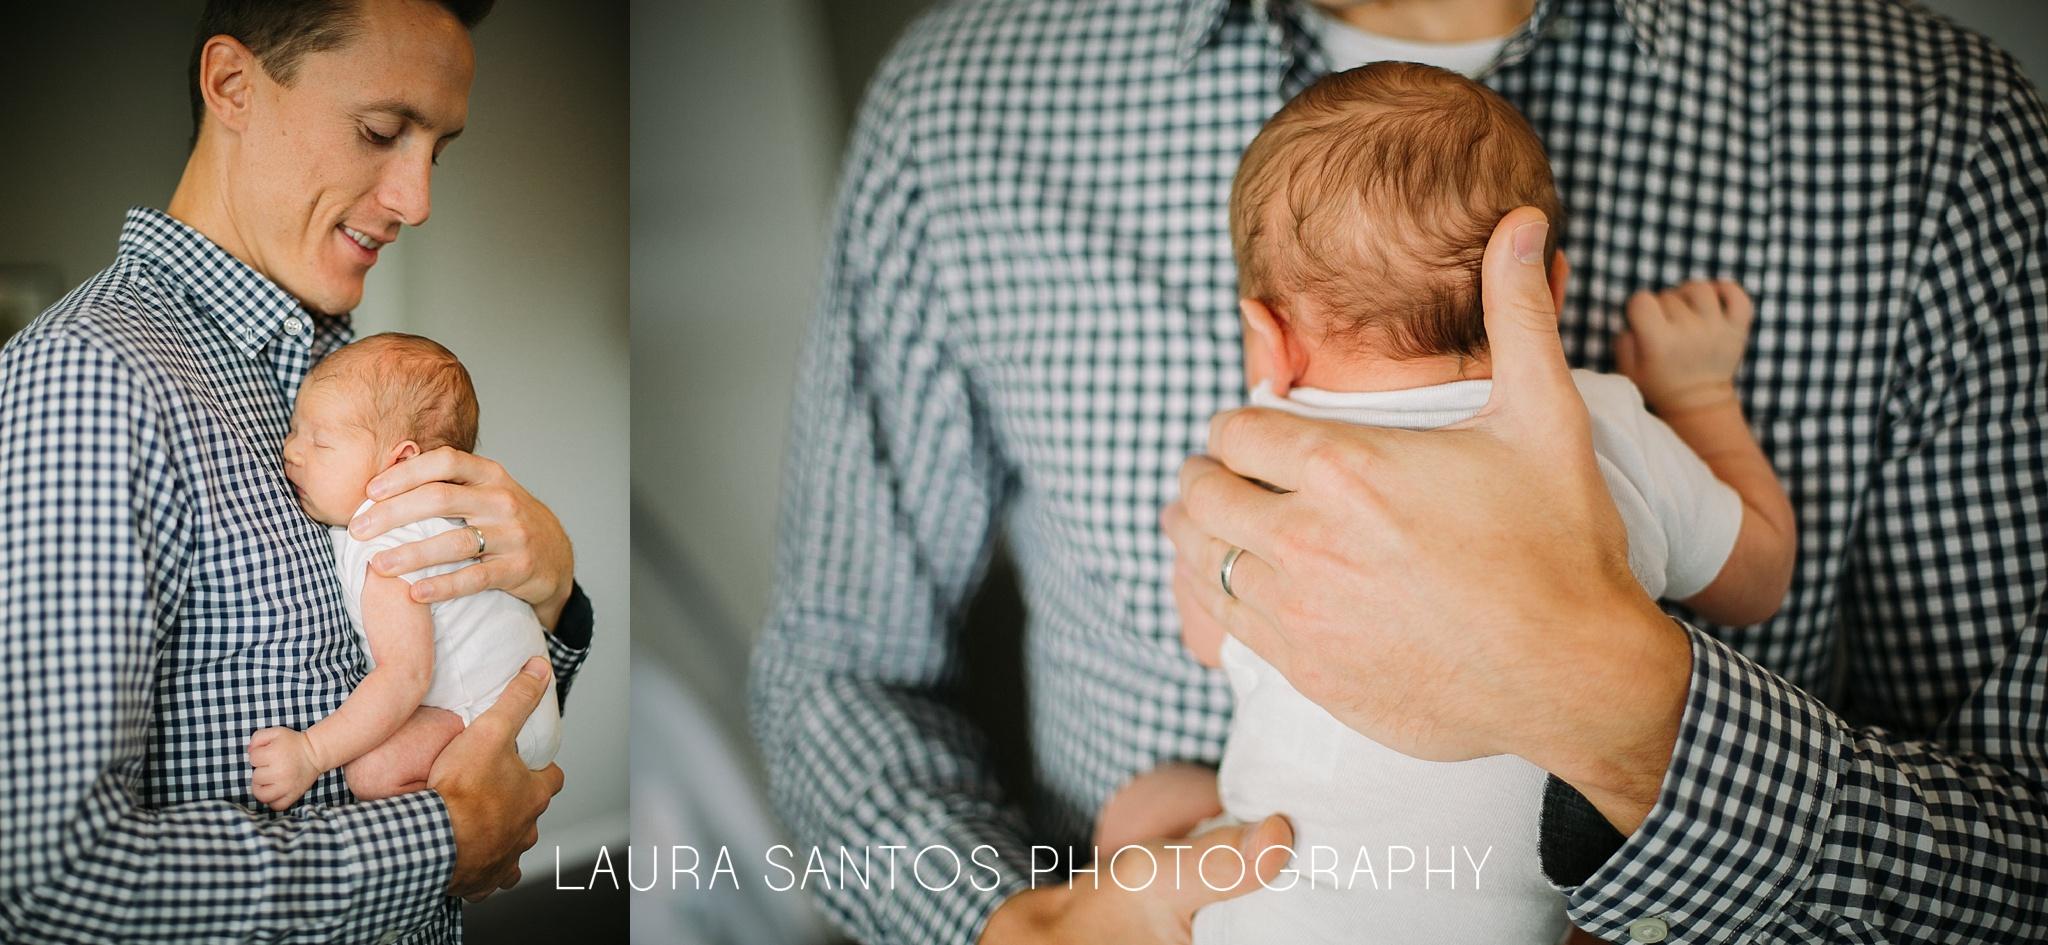 Laura Santos Photography Portland Oregon Family Photographer_0292.jpg